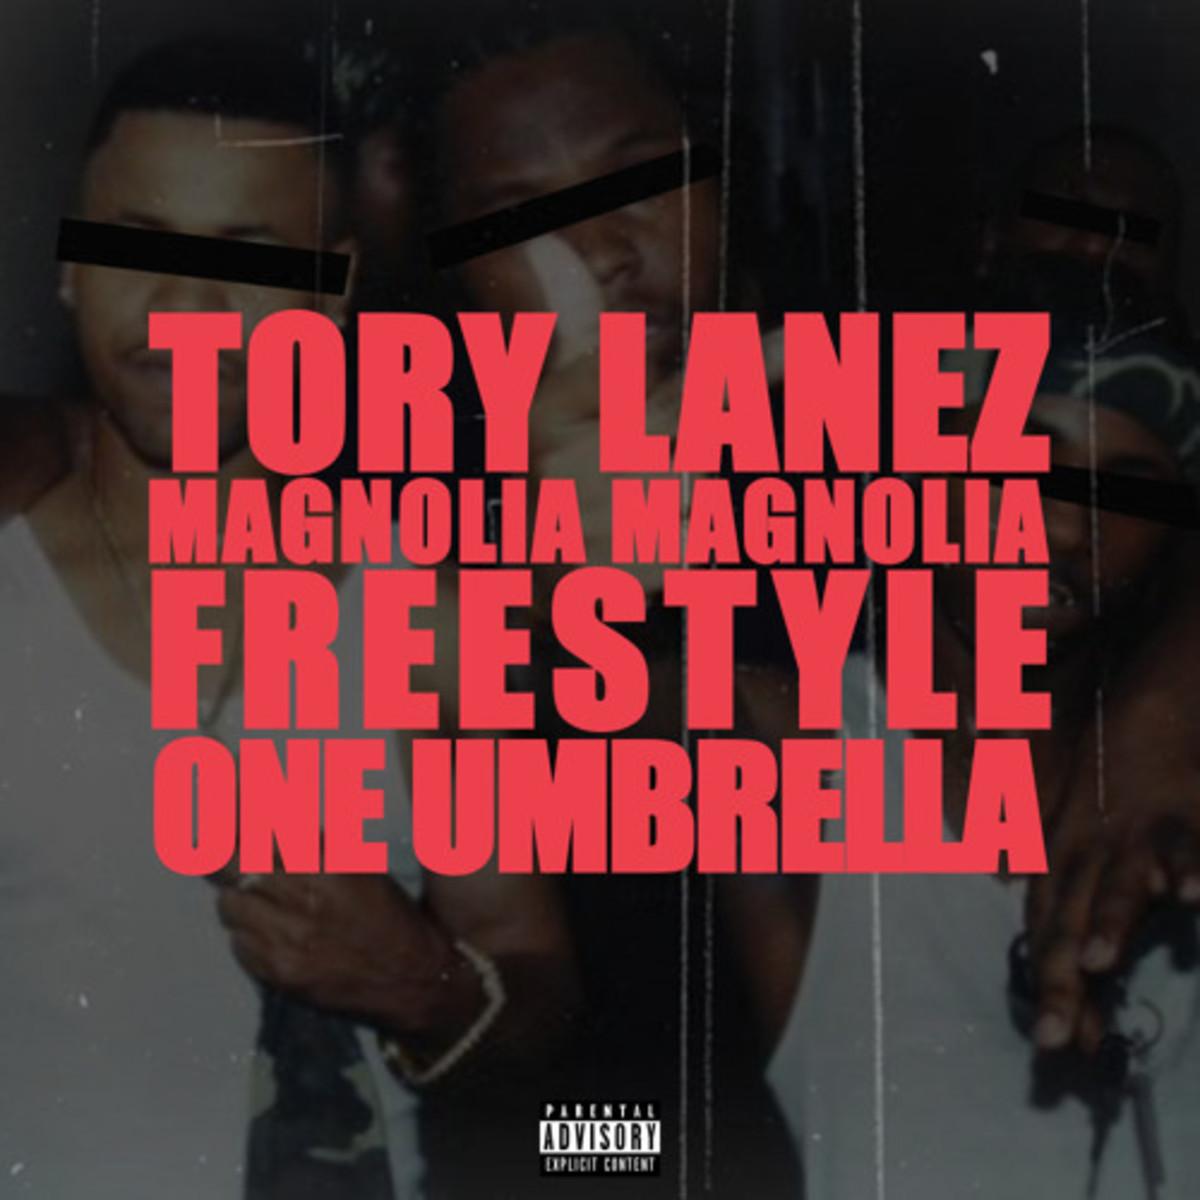 tory-lanez-magnolia-remix.jpg